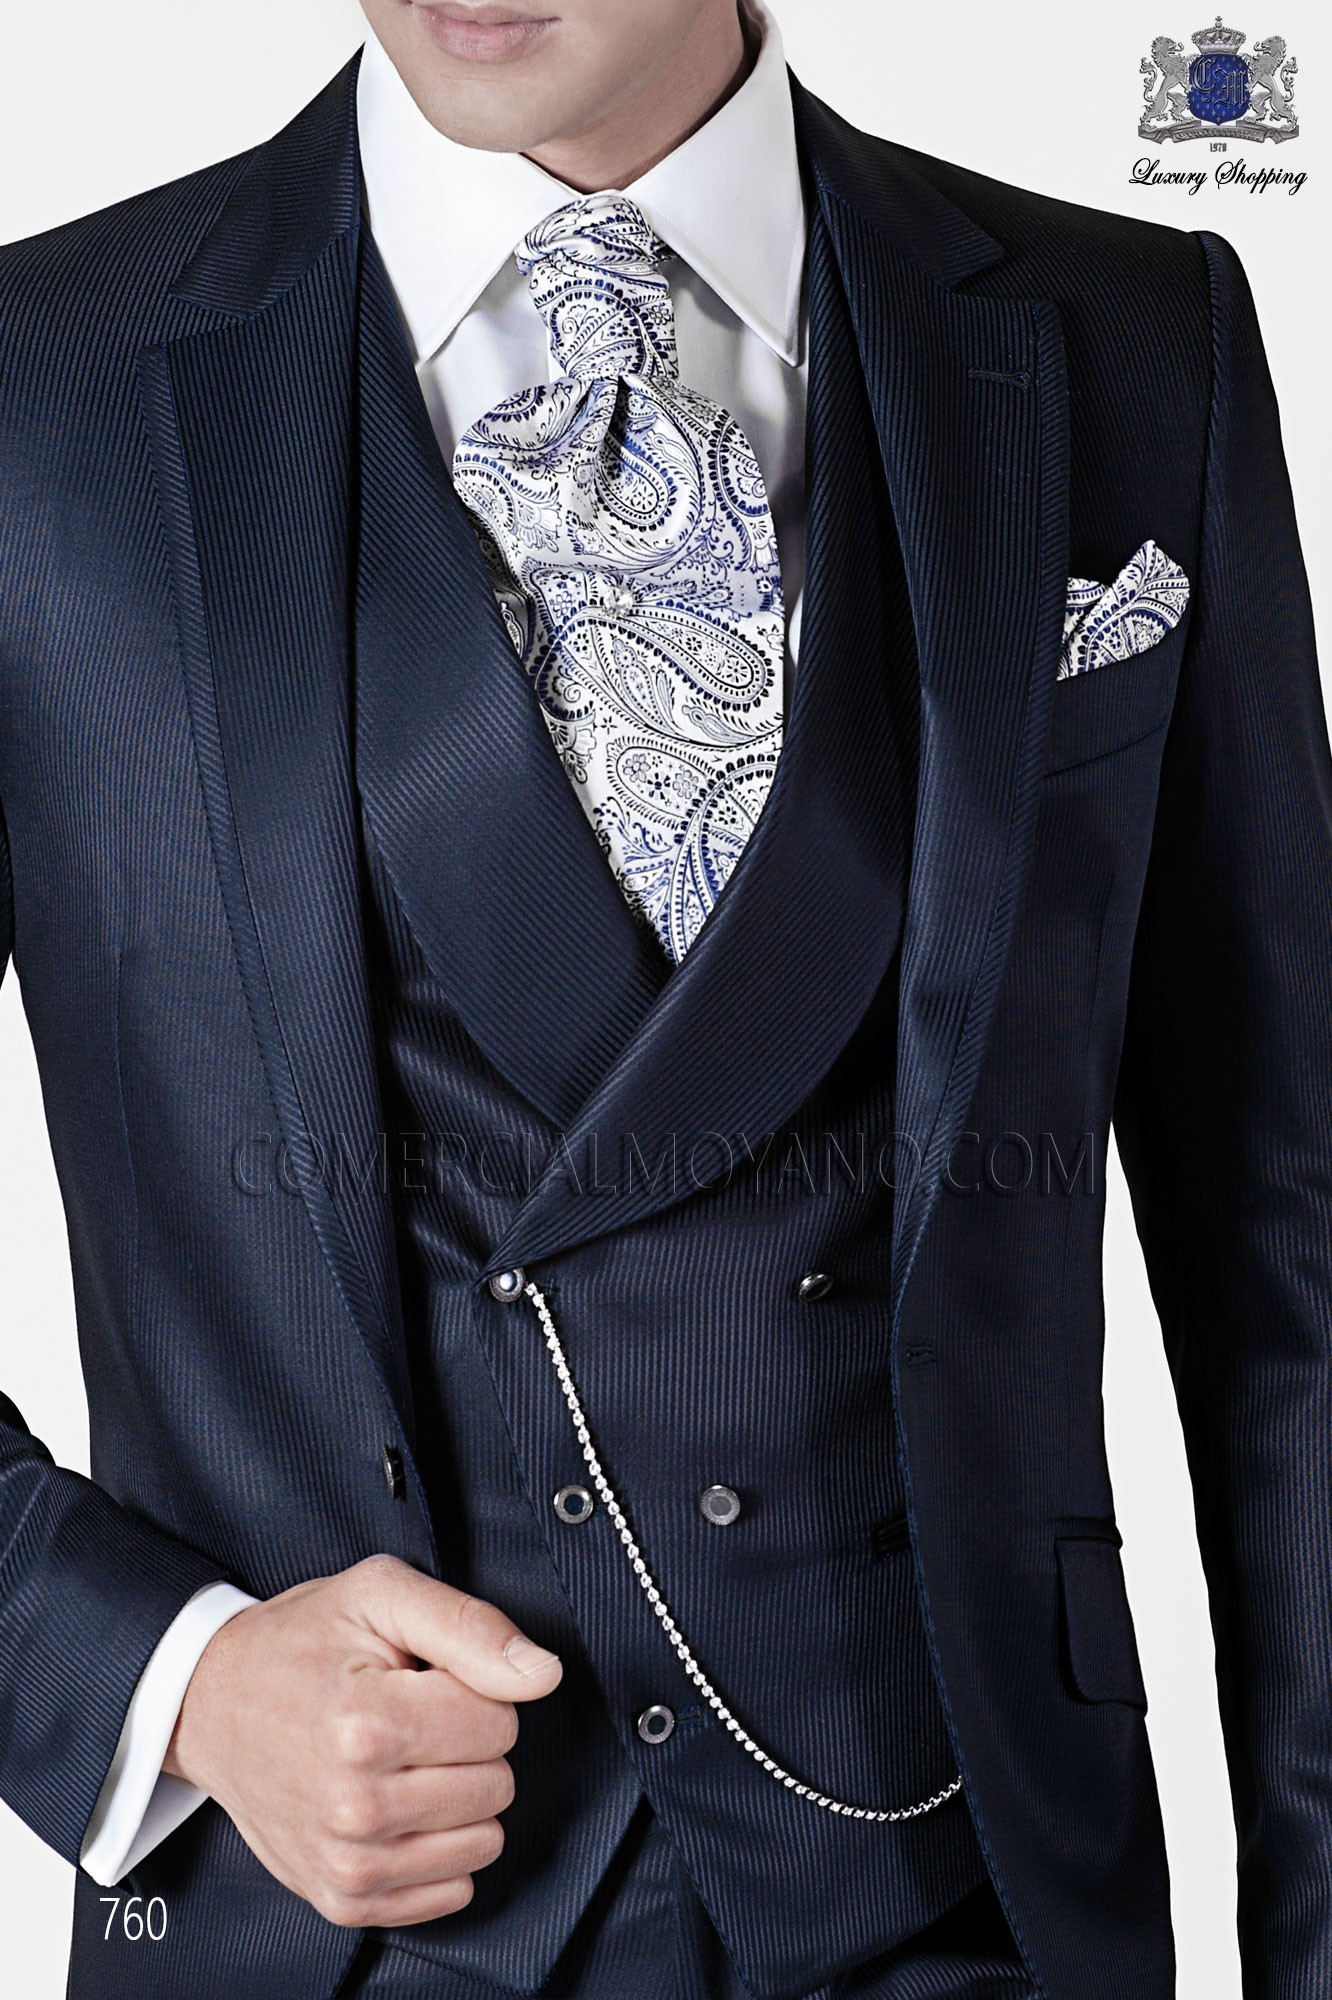 Traje Fashion de novio azul modelo: 760 Ottavio Nuccio Gala colección Fashion 2017